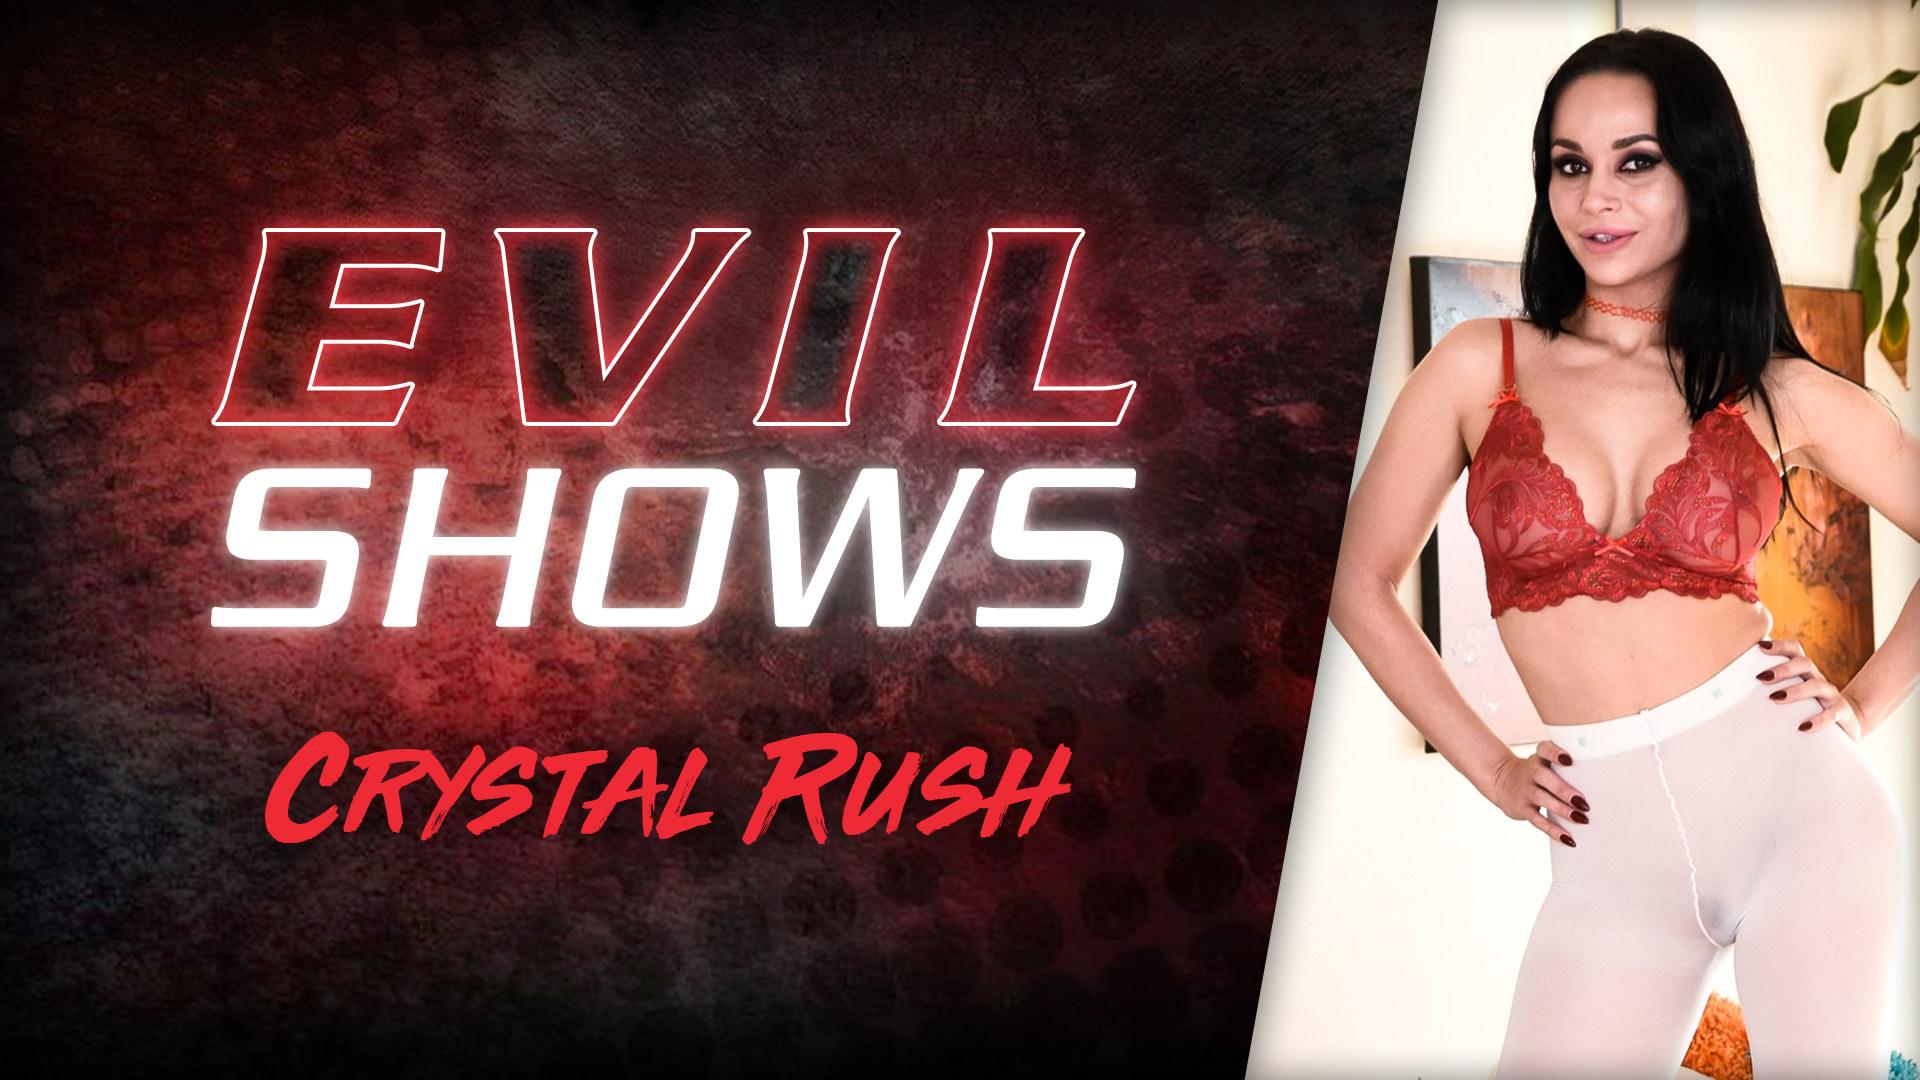 Evil Shows - Crystal Rush - Crystal Rush 1